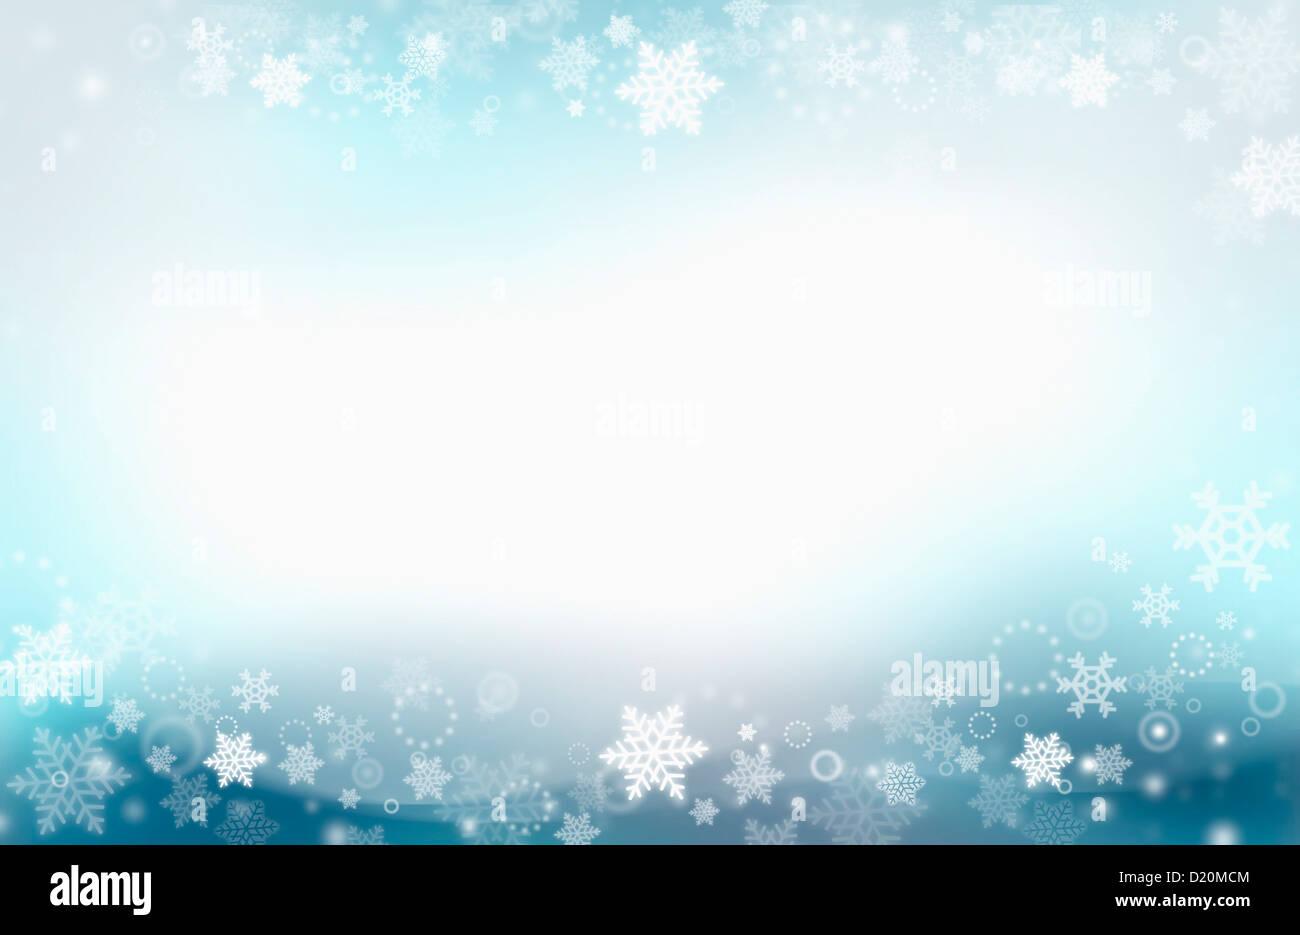 Ppt Background Template Design Blue Imágenes De Stock & Ppt ...